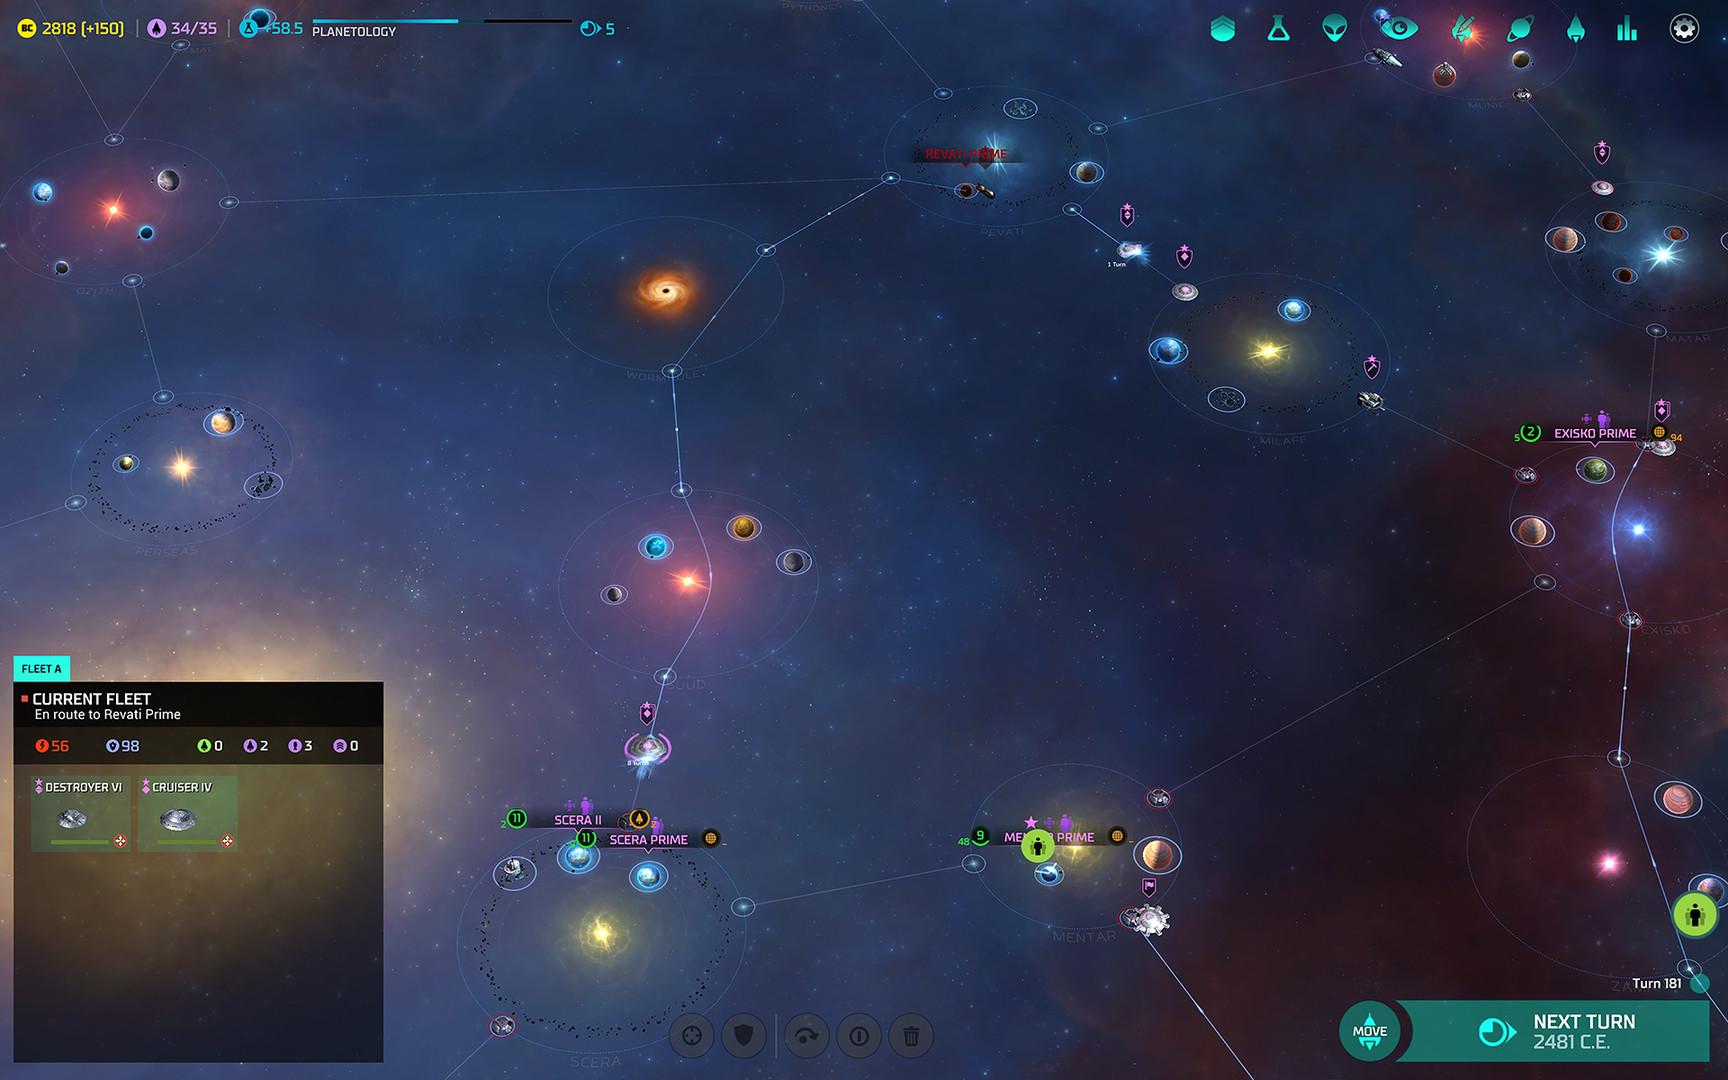 Master of Orion: Conquer The Stars za darmo za wygranie bitwy w World of Tanks